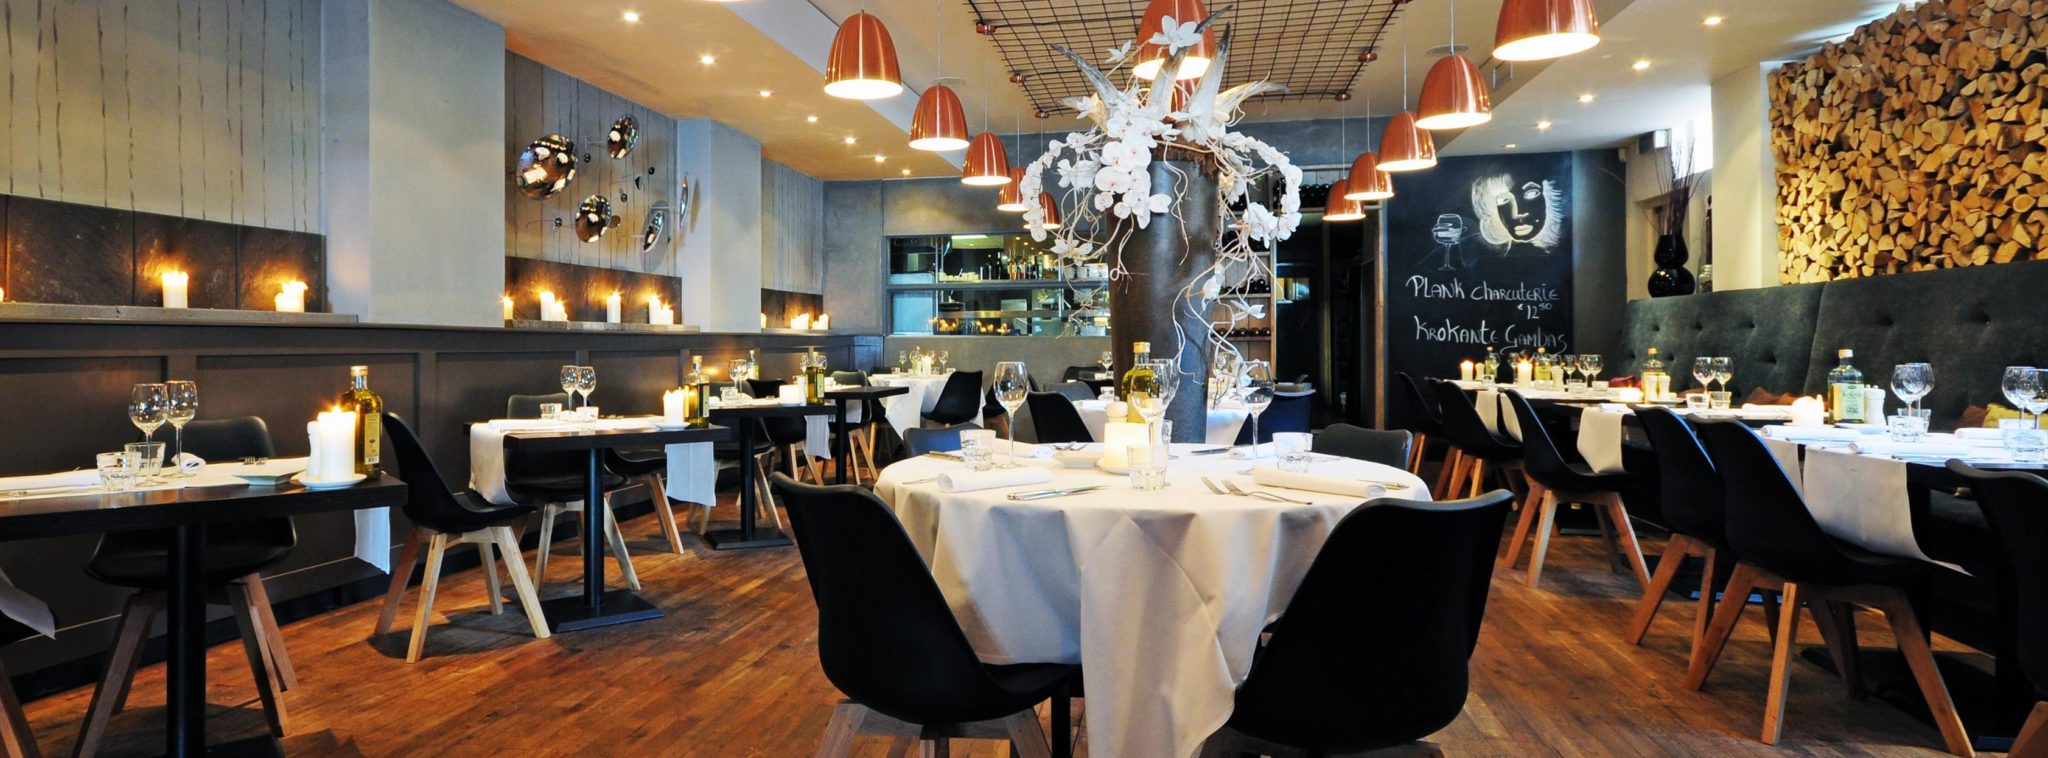 Beste restaurants in Eindhoven